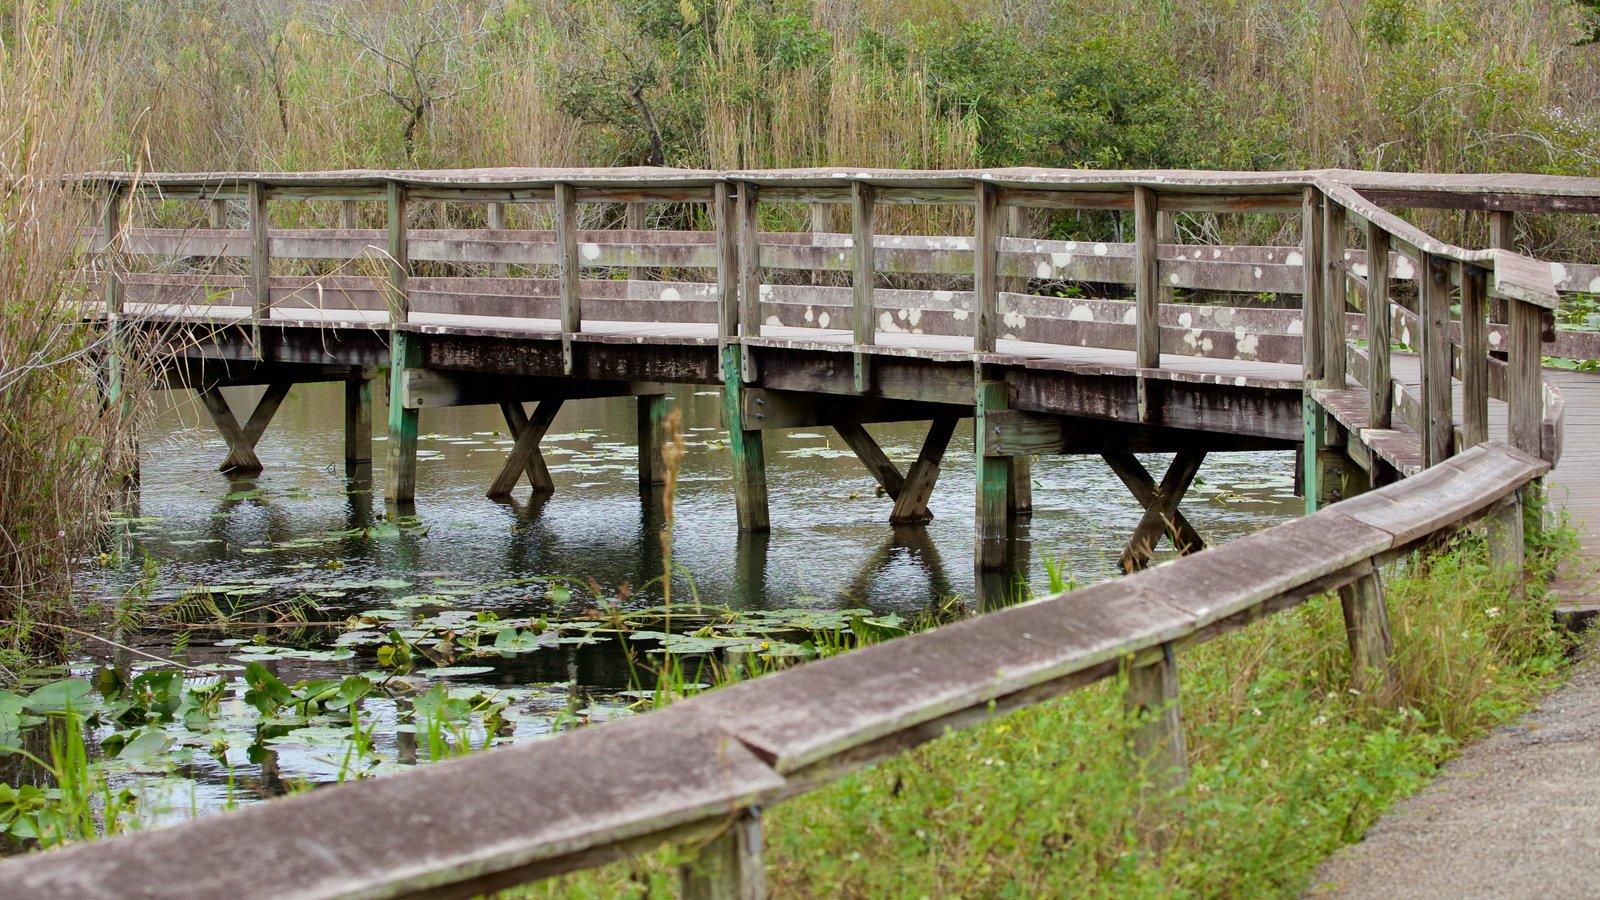 Southeast Florida showing a bridge and a lake or waterhole